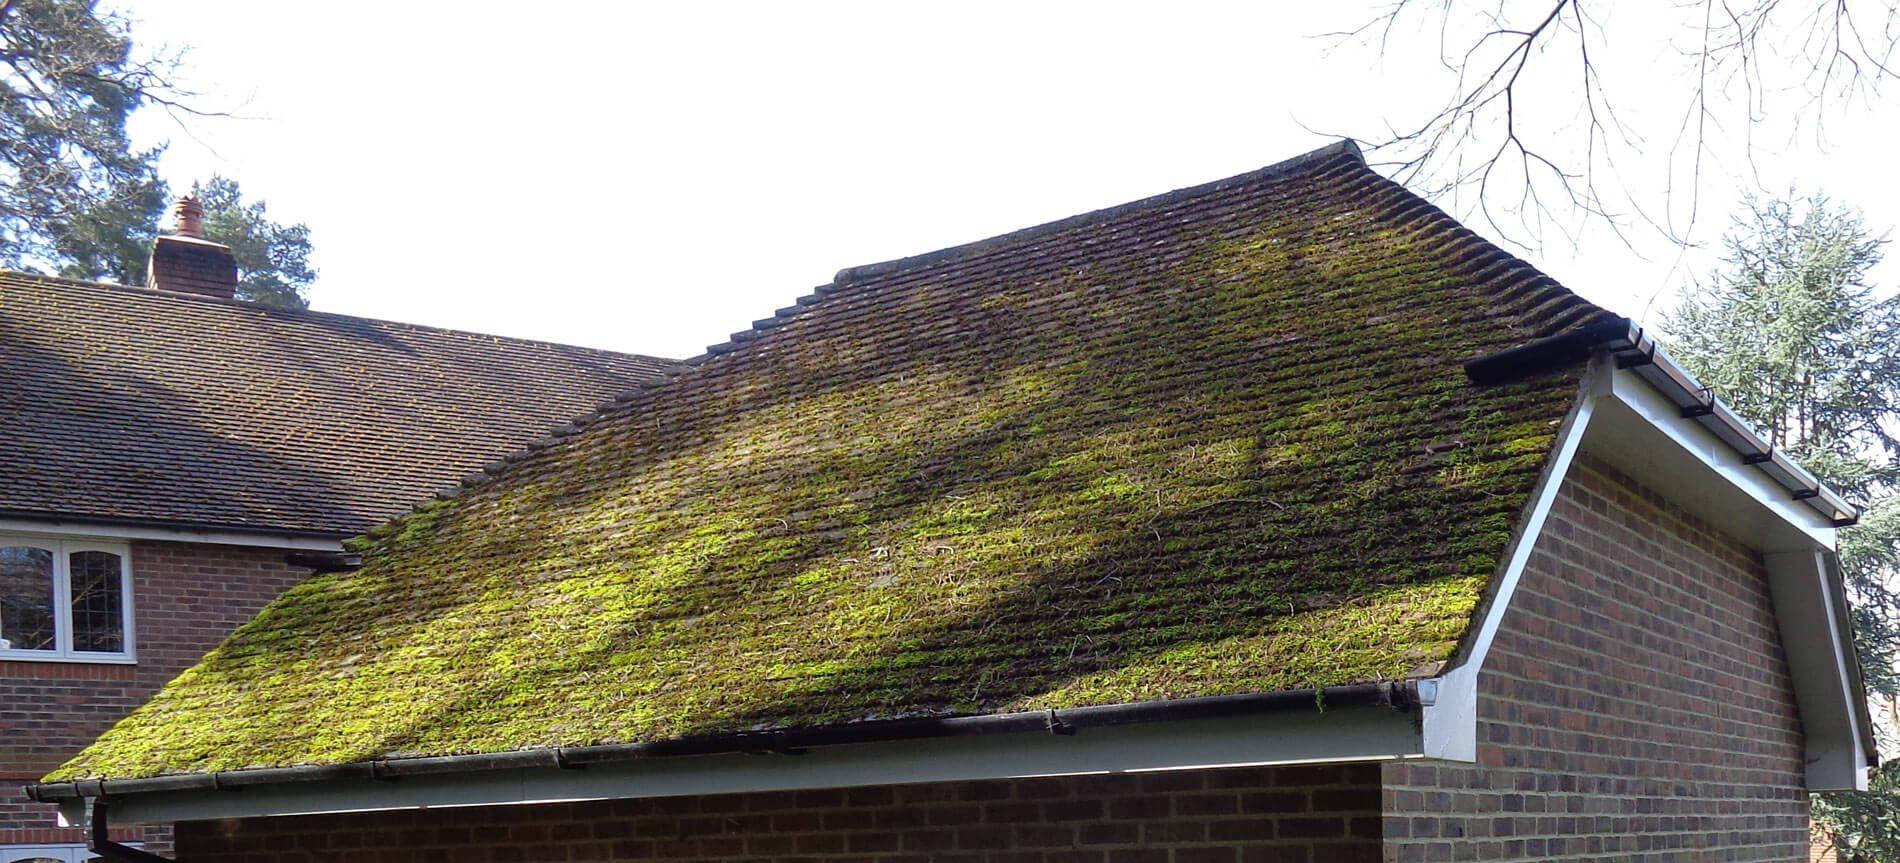 Other Roofline Services Farnham South East Uk Roofline Solutions